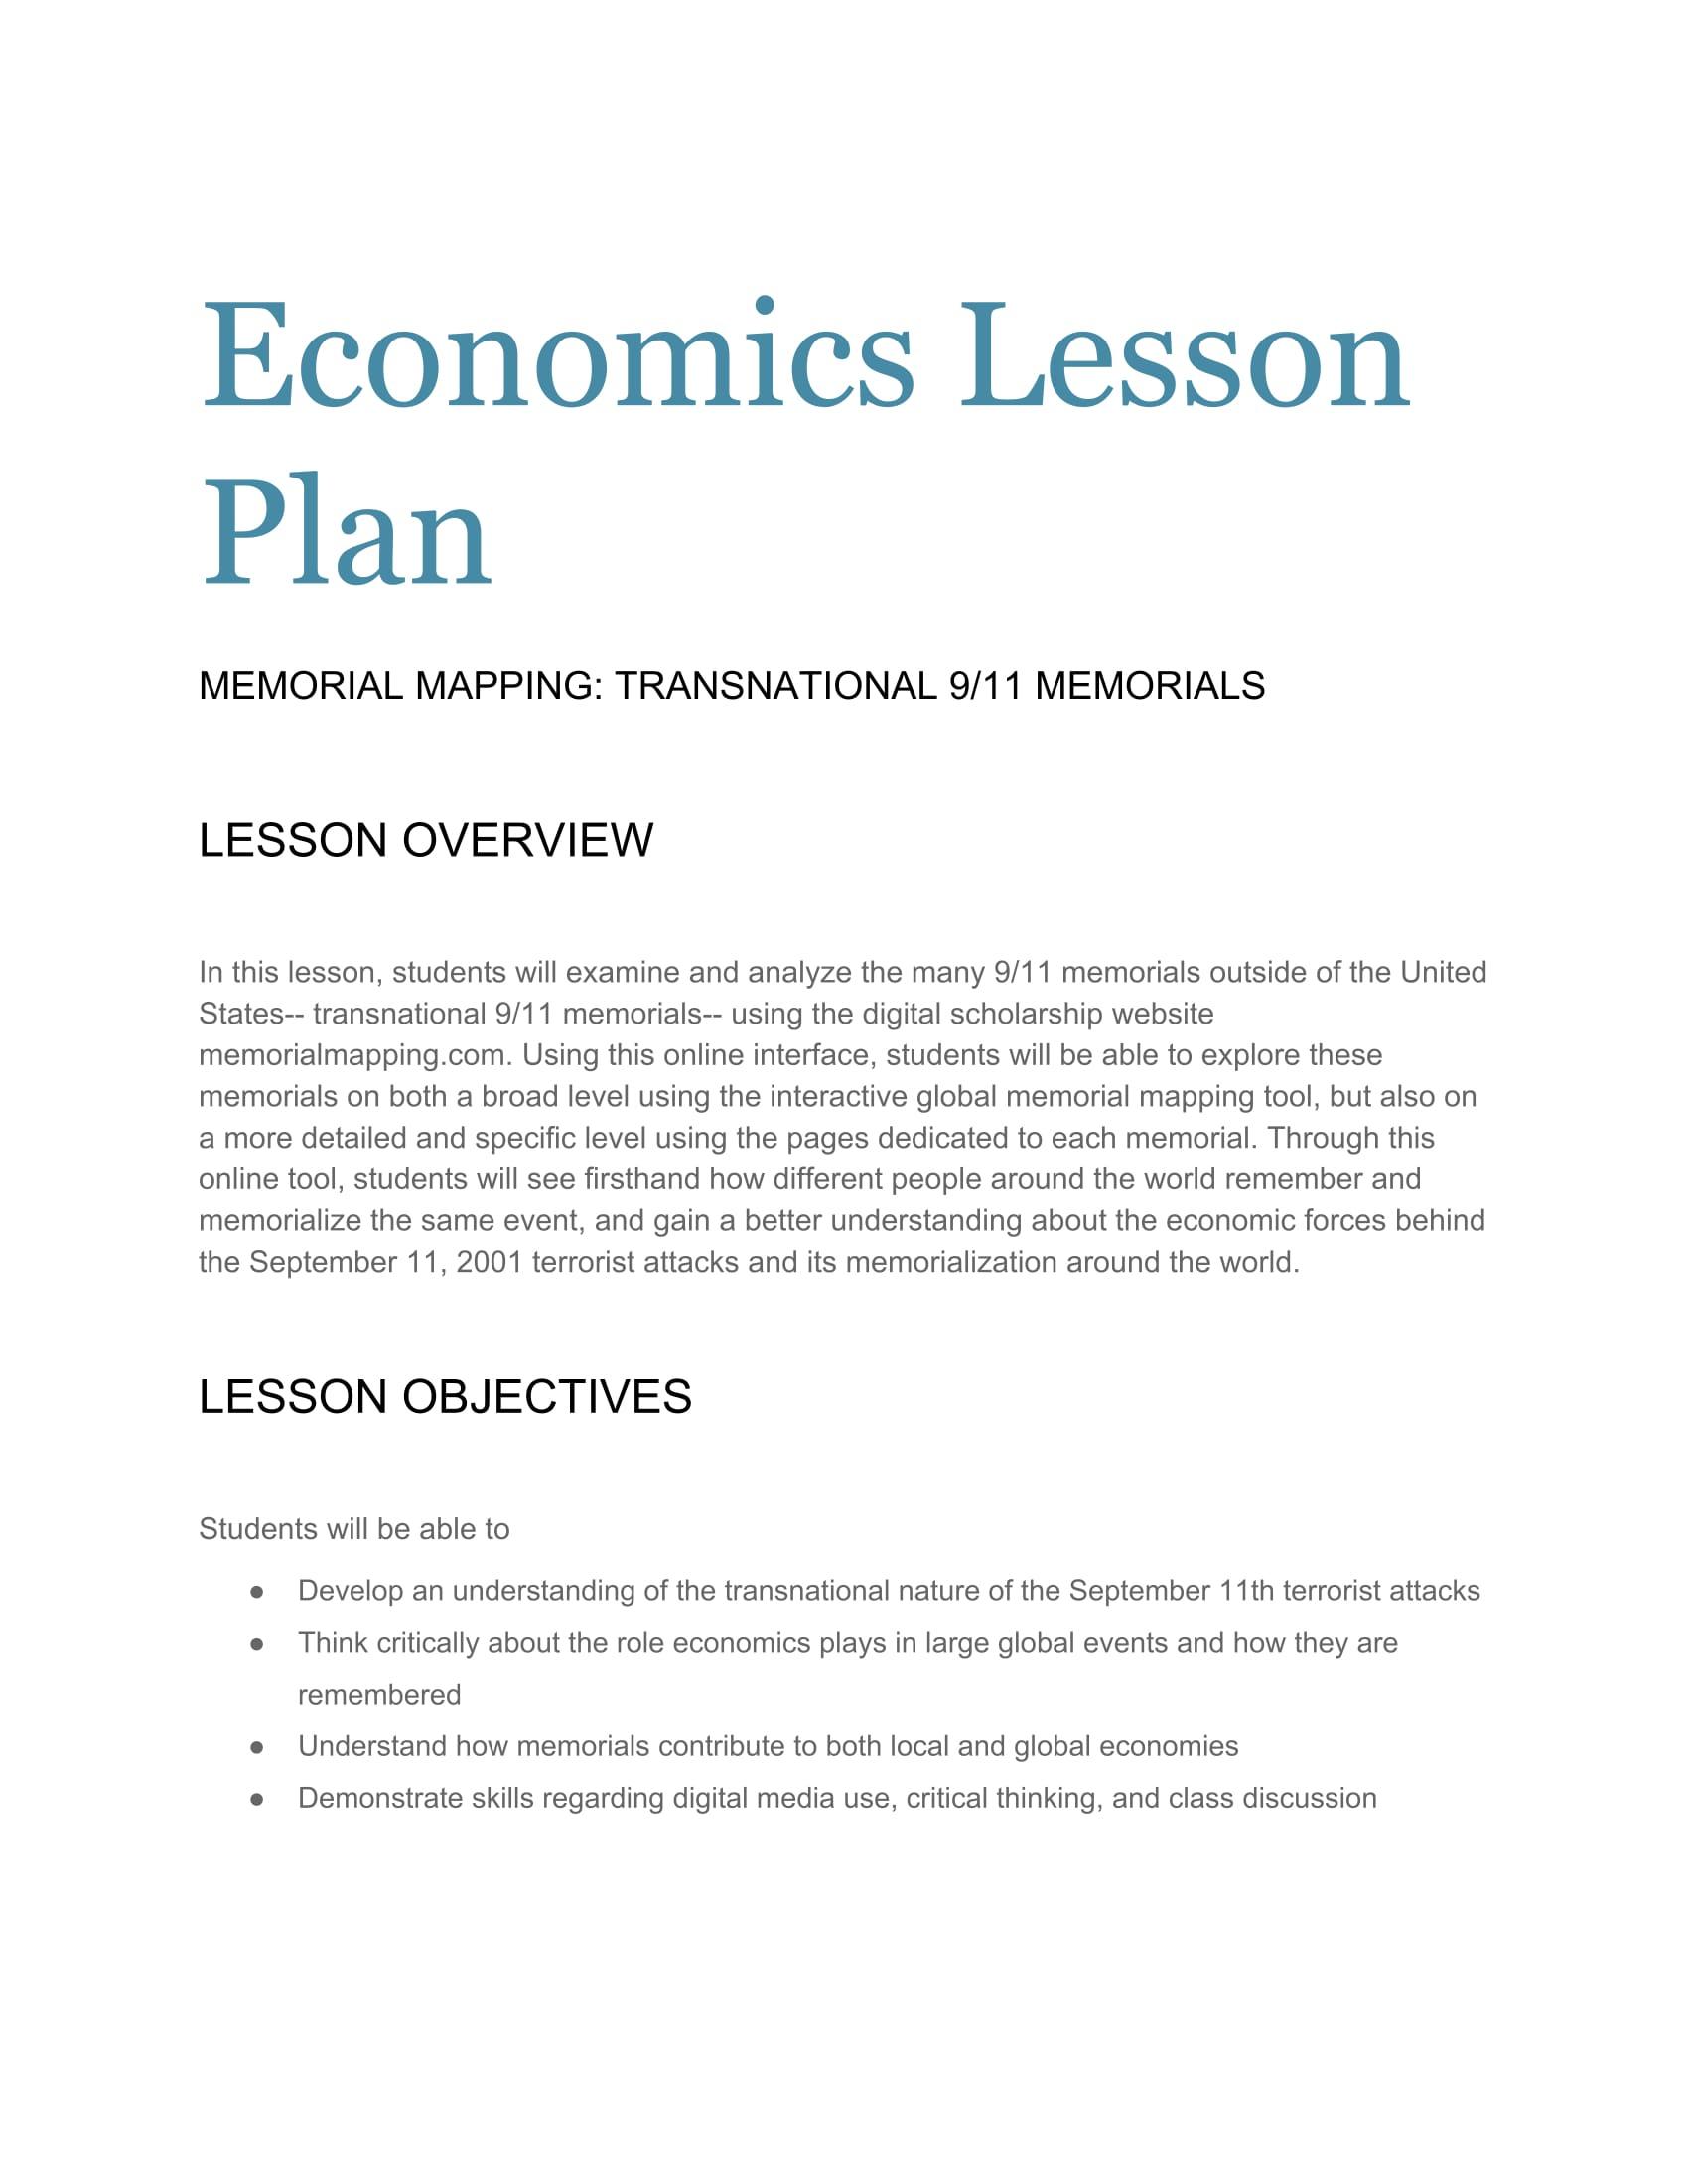 Economics Lesson Plan (1)-1.jpg